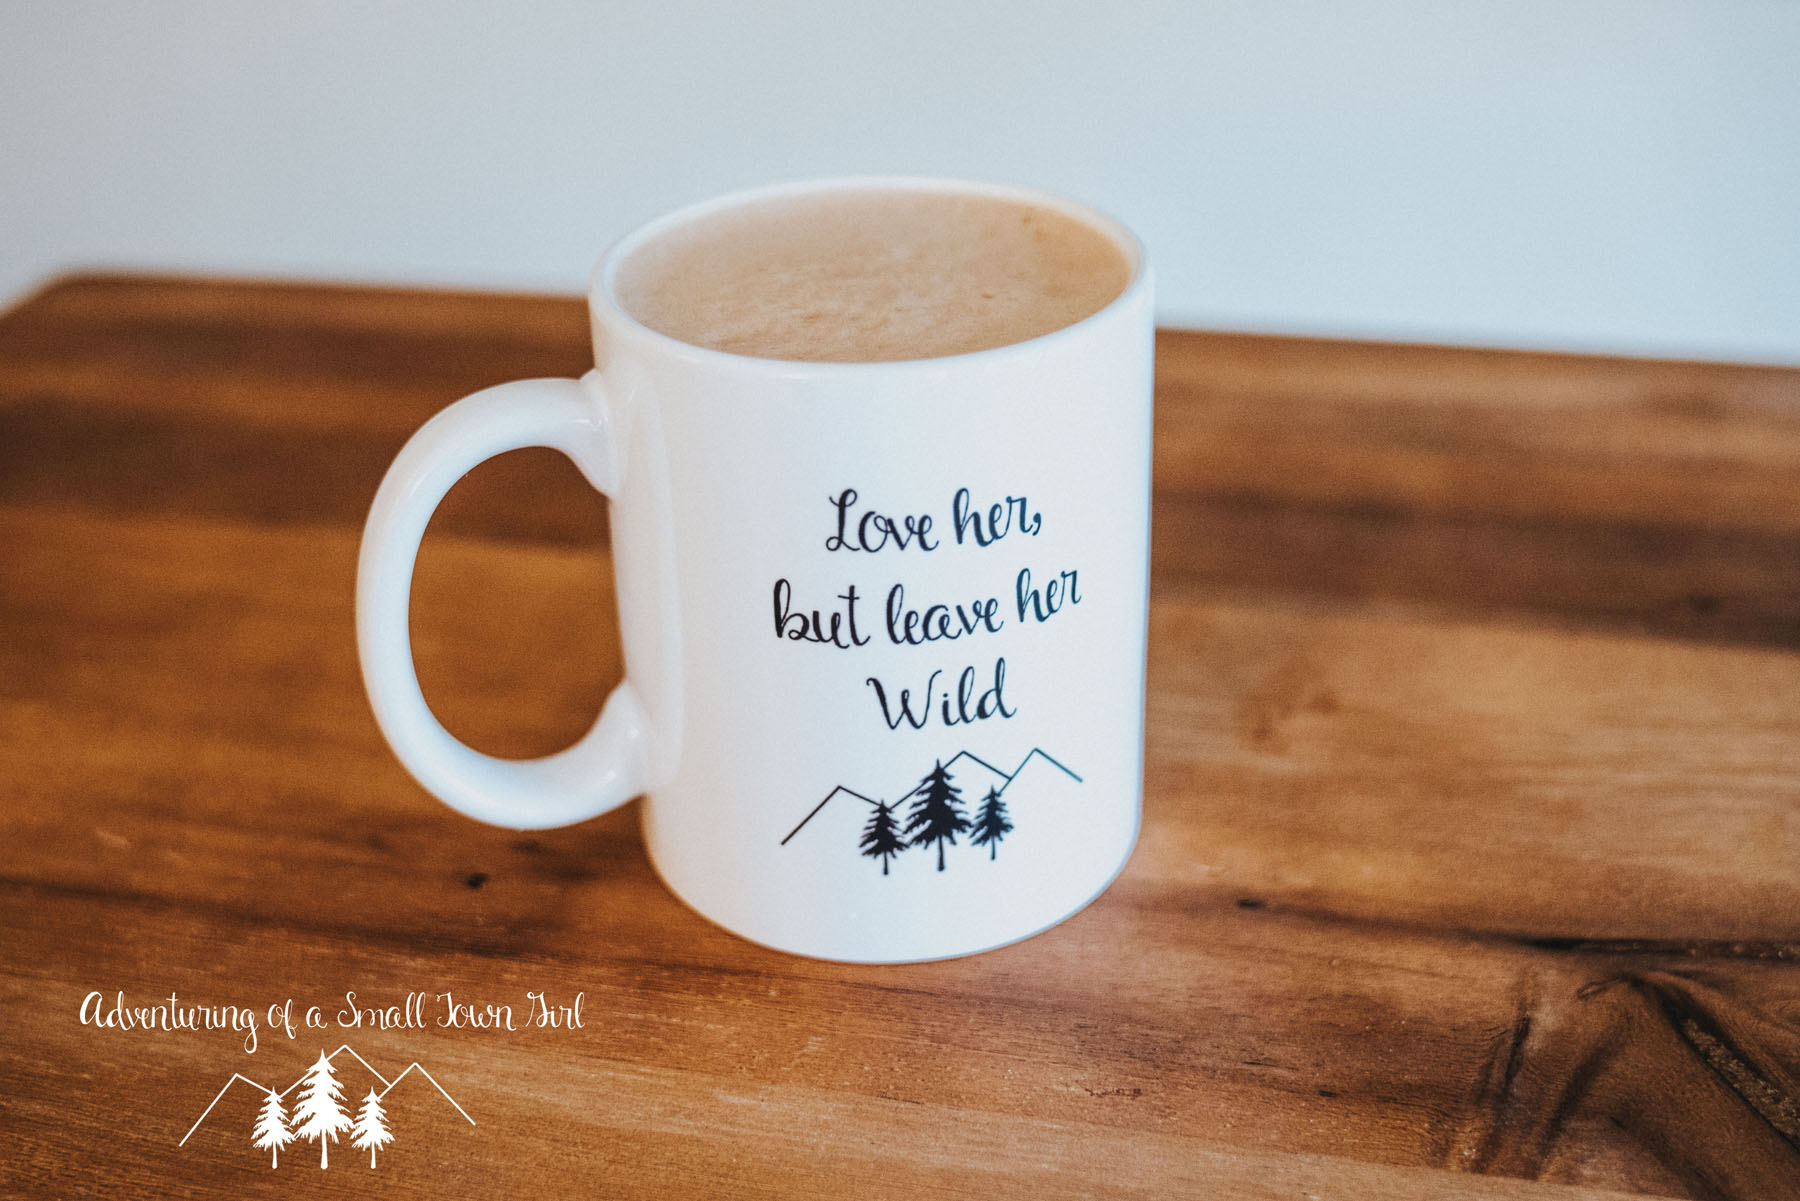 Healthy Latte Recipe - Starbucks Hack - Adventuring of a Small Town Girl-9.jpg